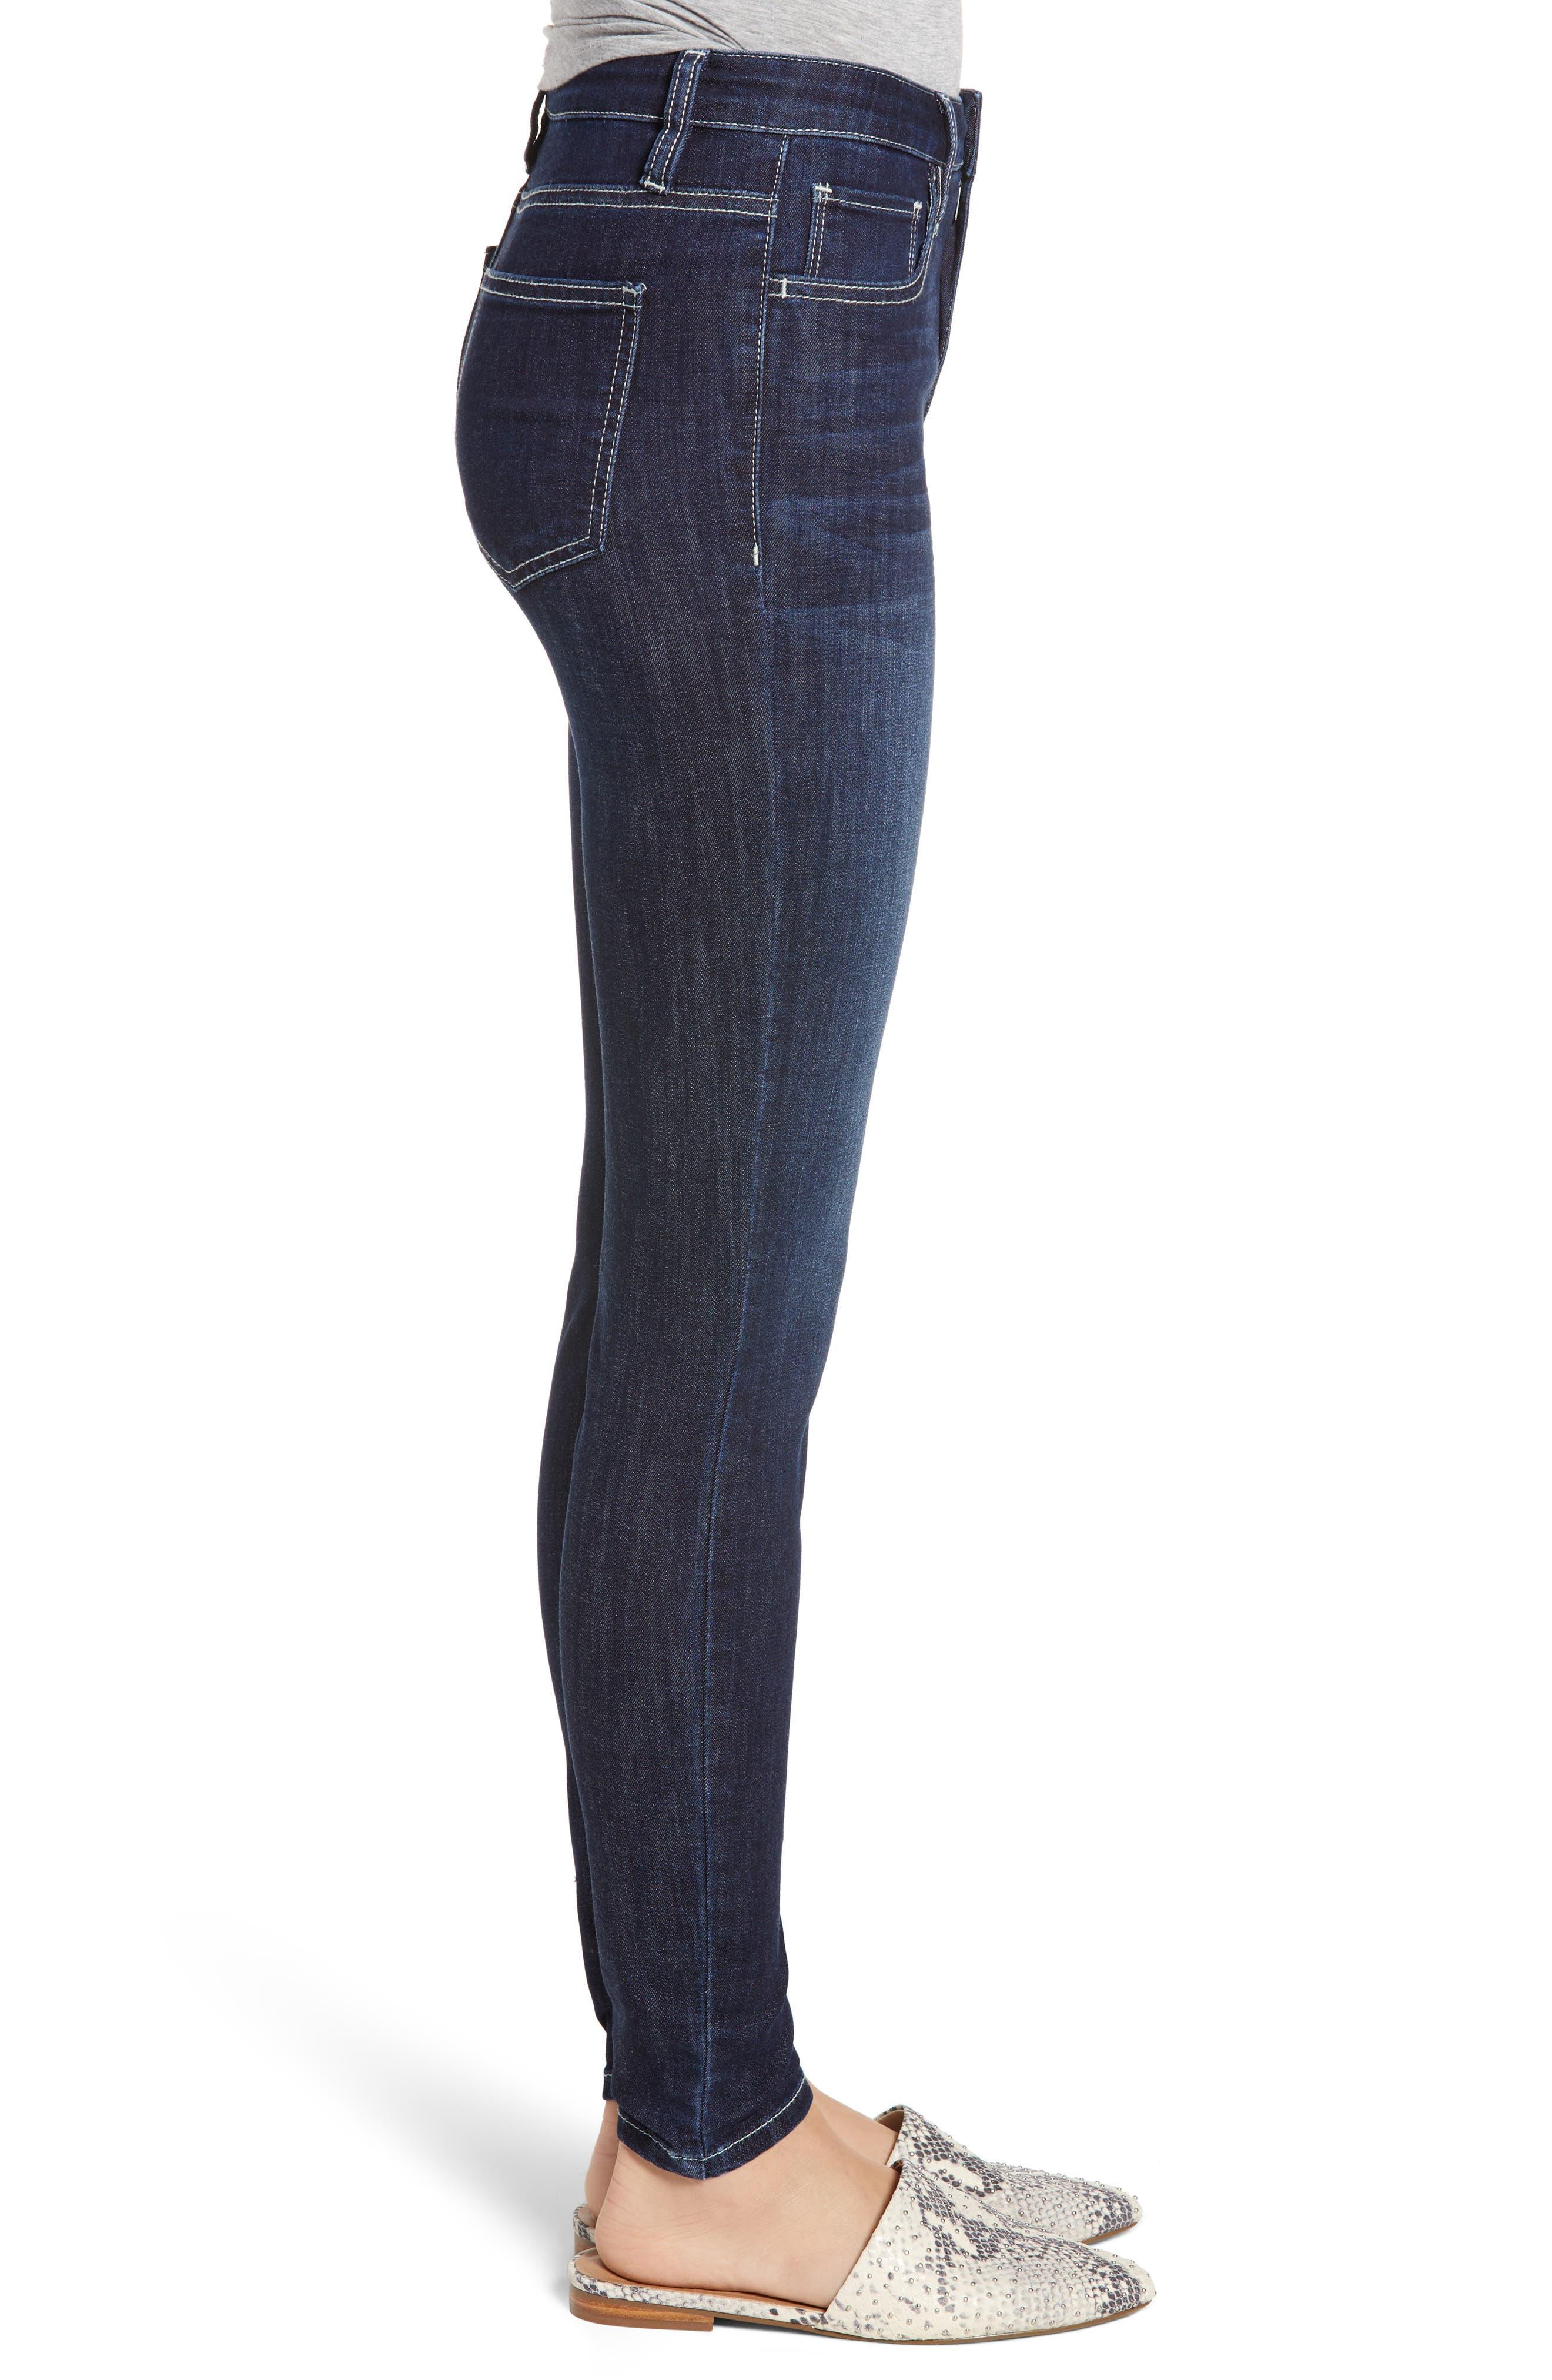 PROSPERITY DENIM, Contrast Stitch Skinny Jeans, Alternate thumbnail 3, color, DARK WASH